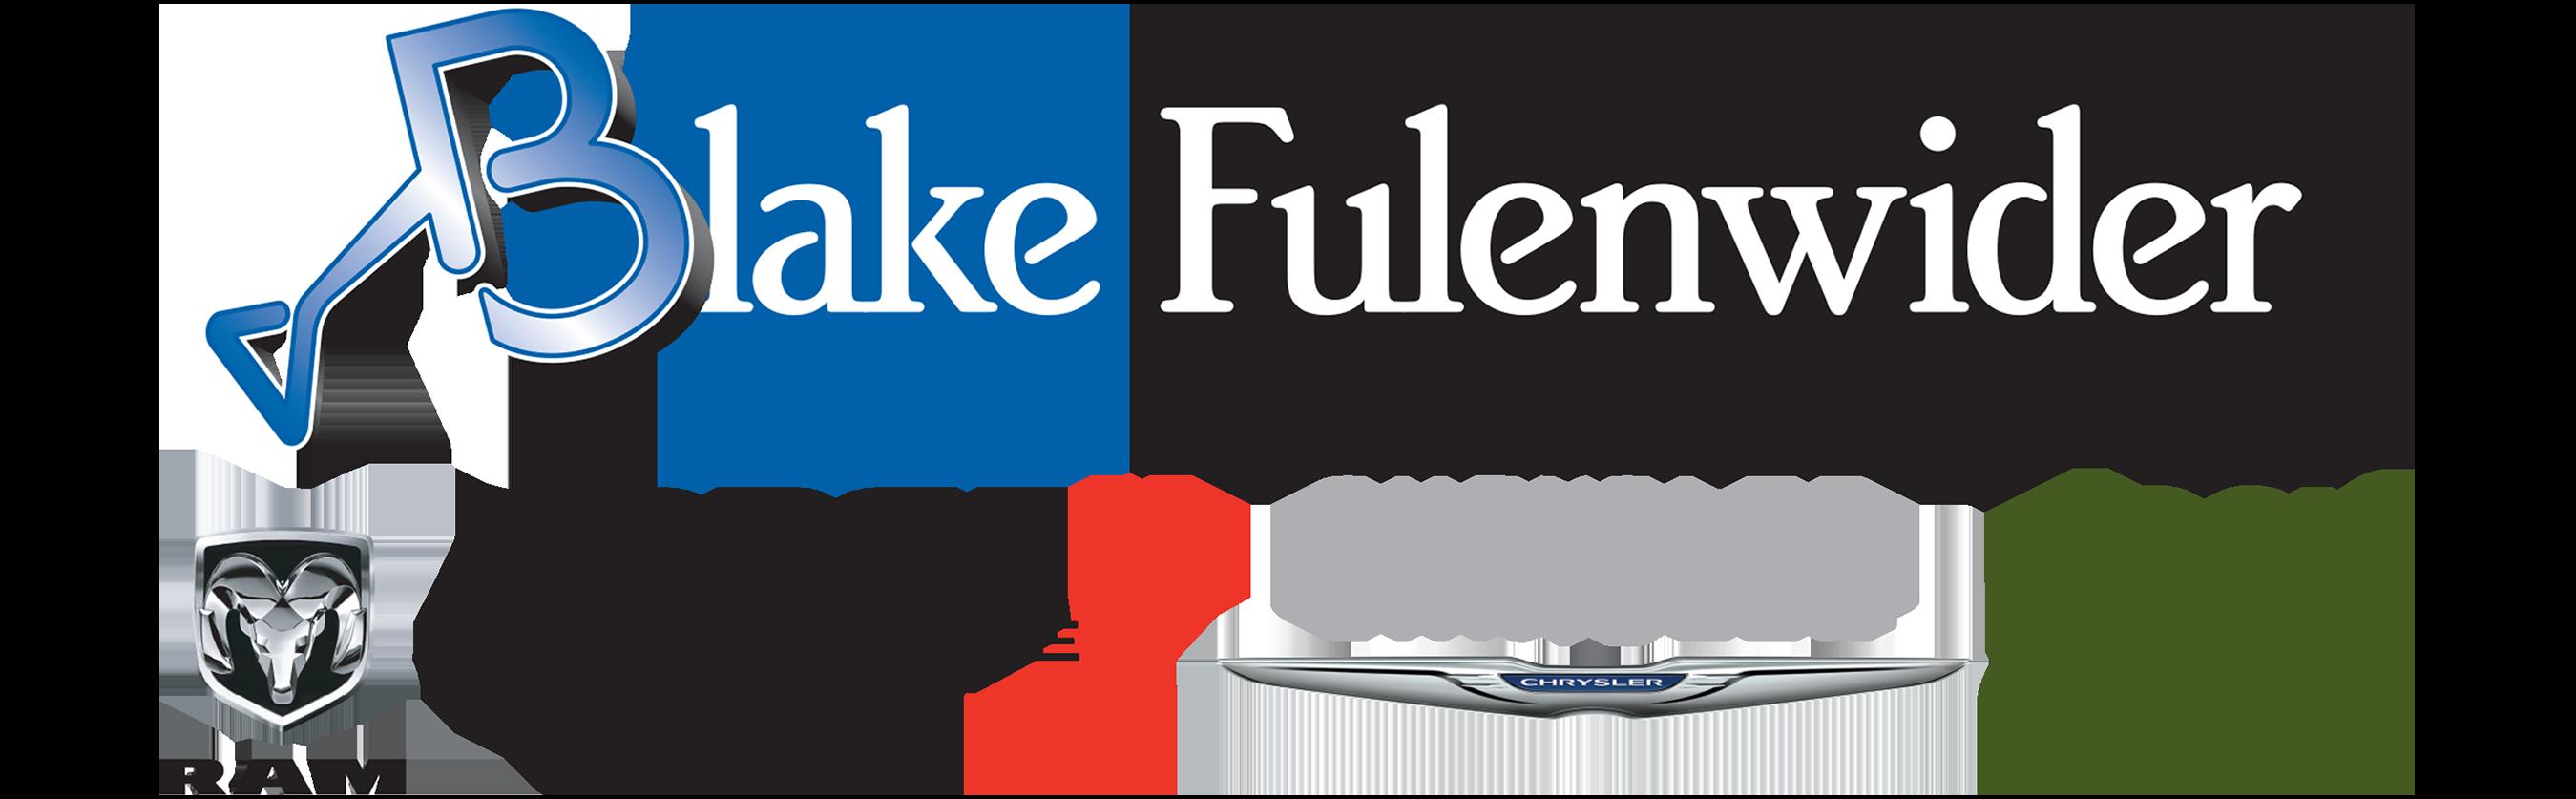 Blake Fulenwider Chrysler Dodge Jeep Ram